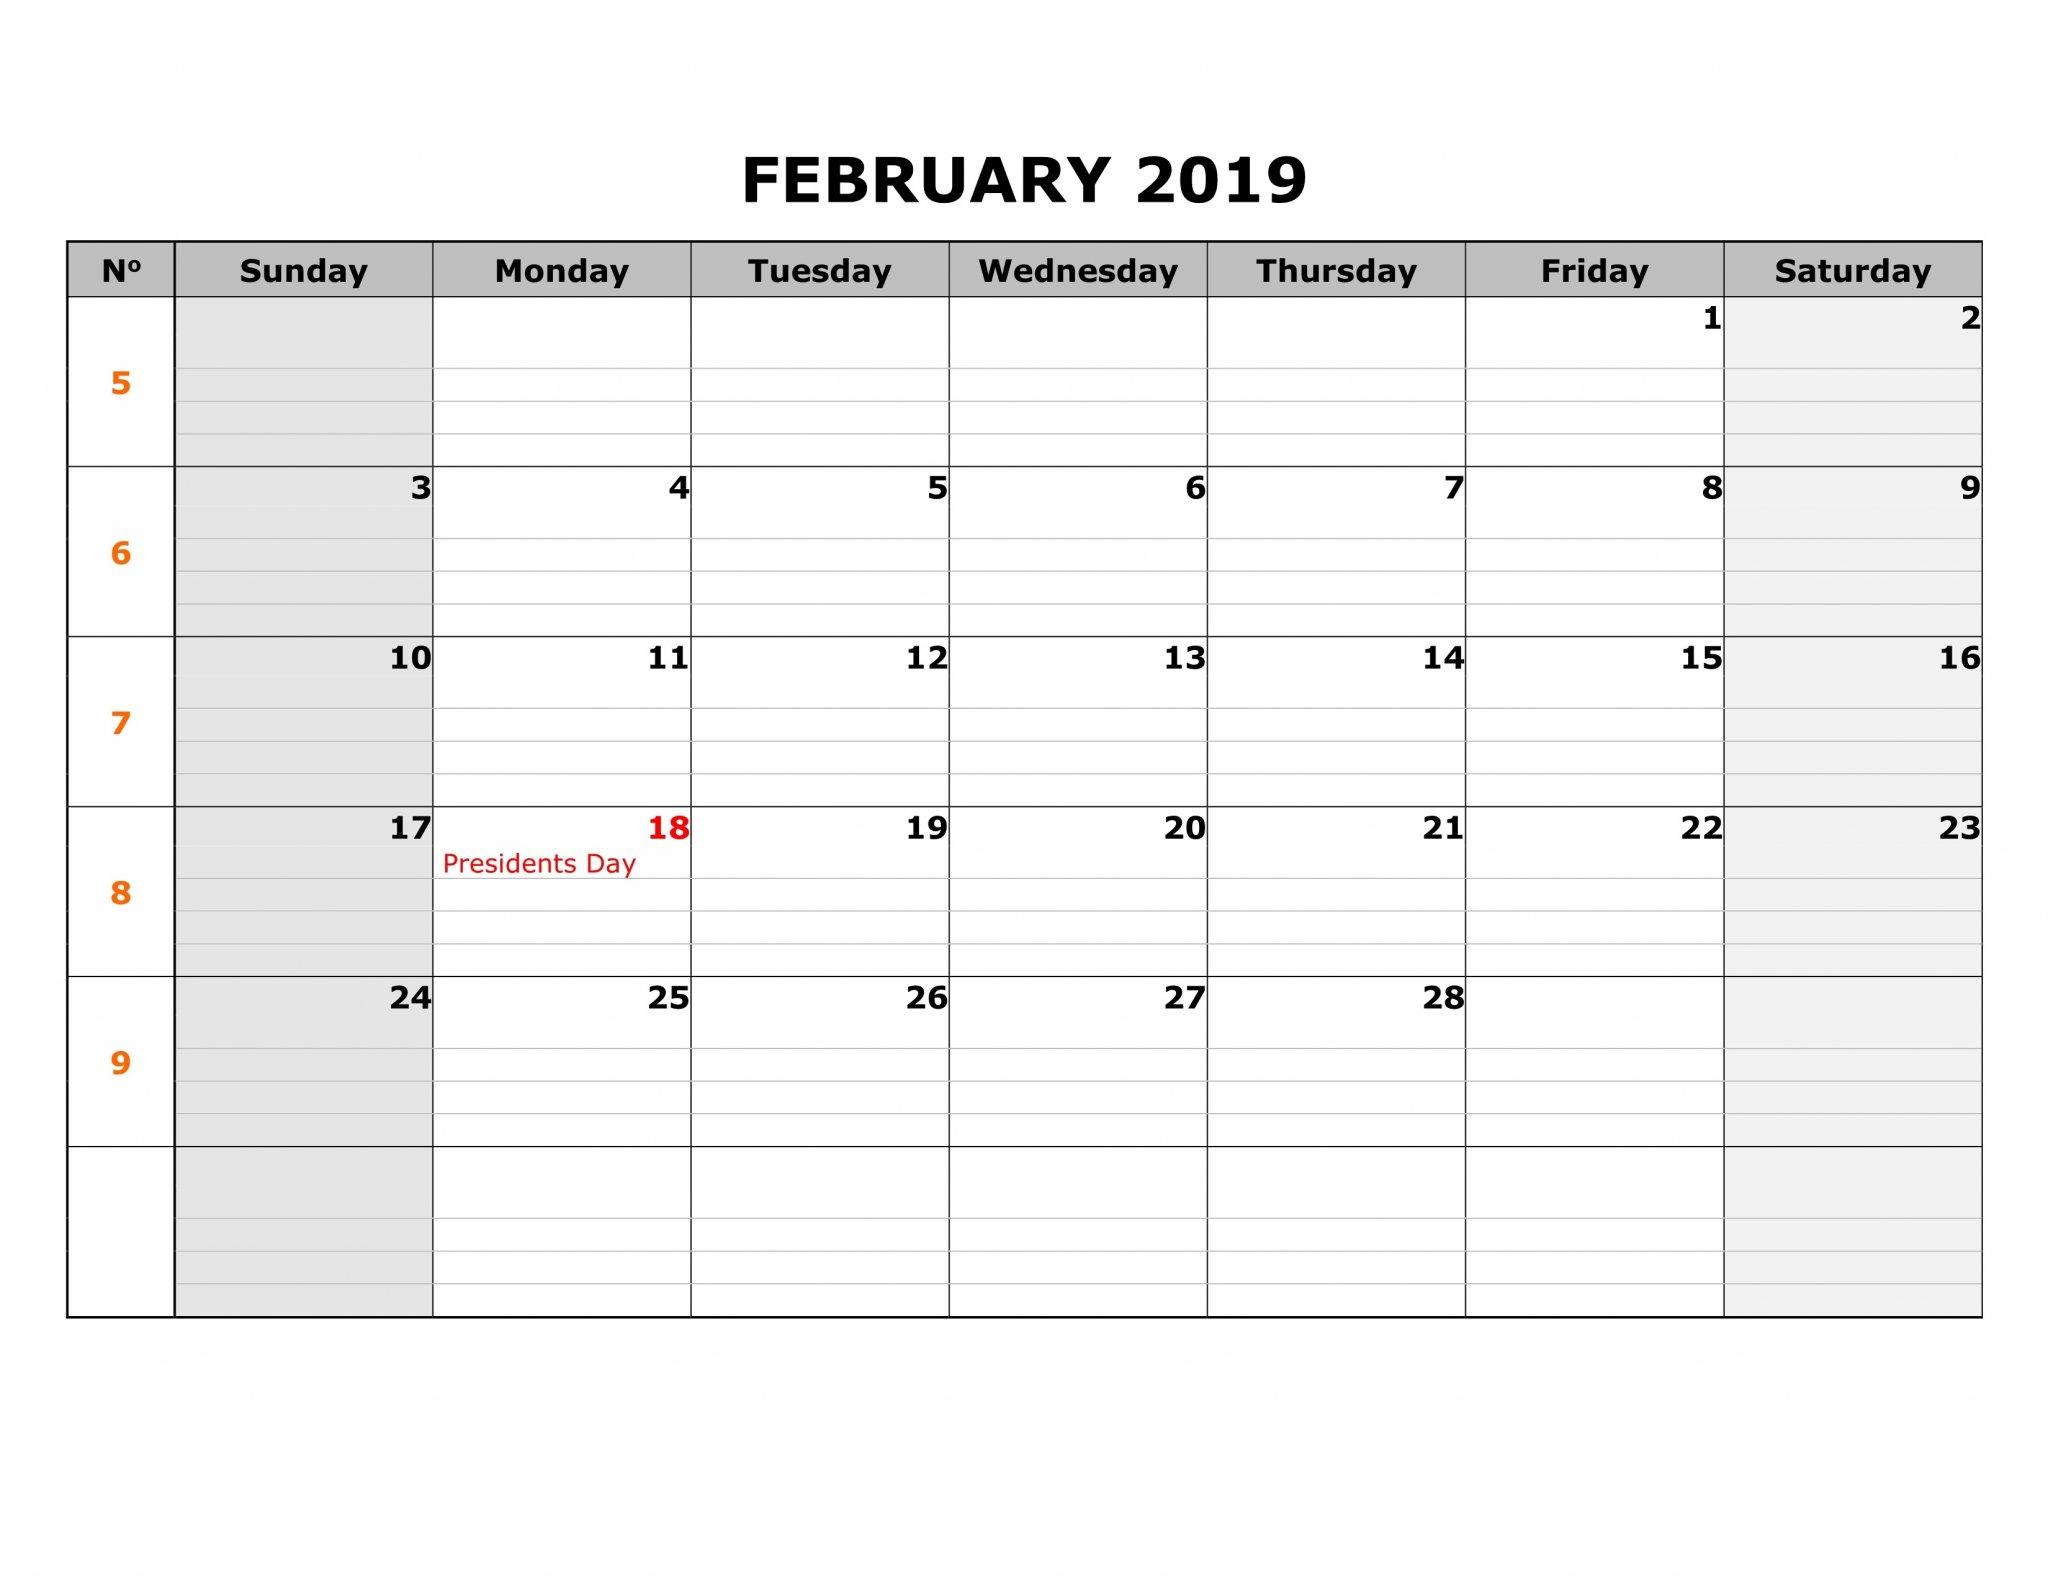 February 2019 Calendar UK With National Holidays